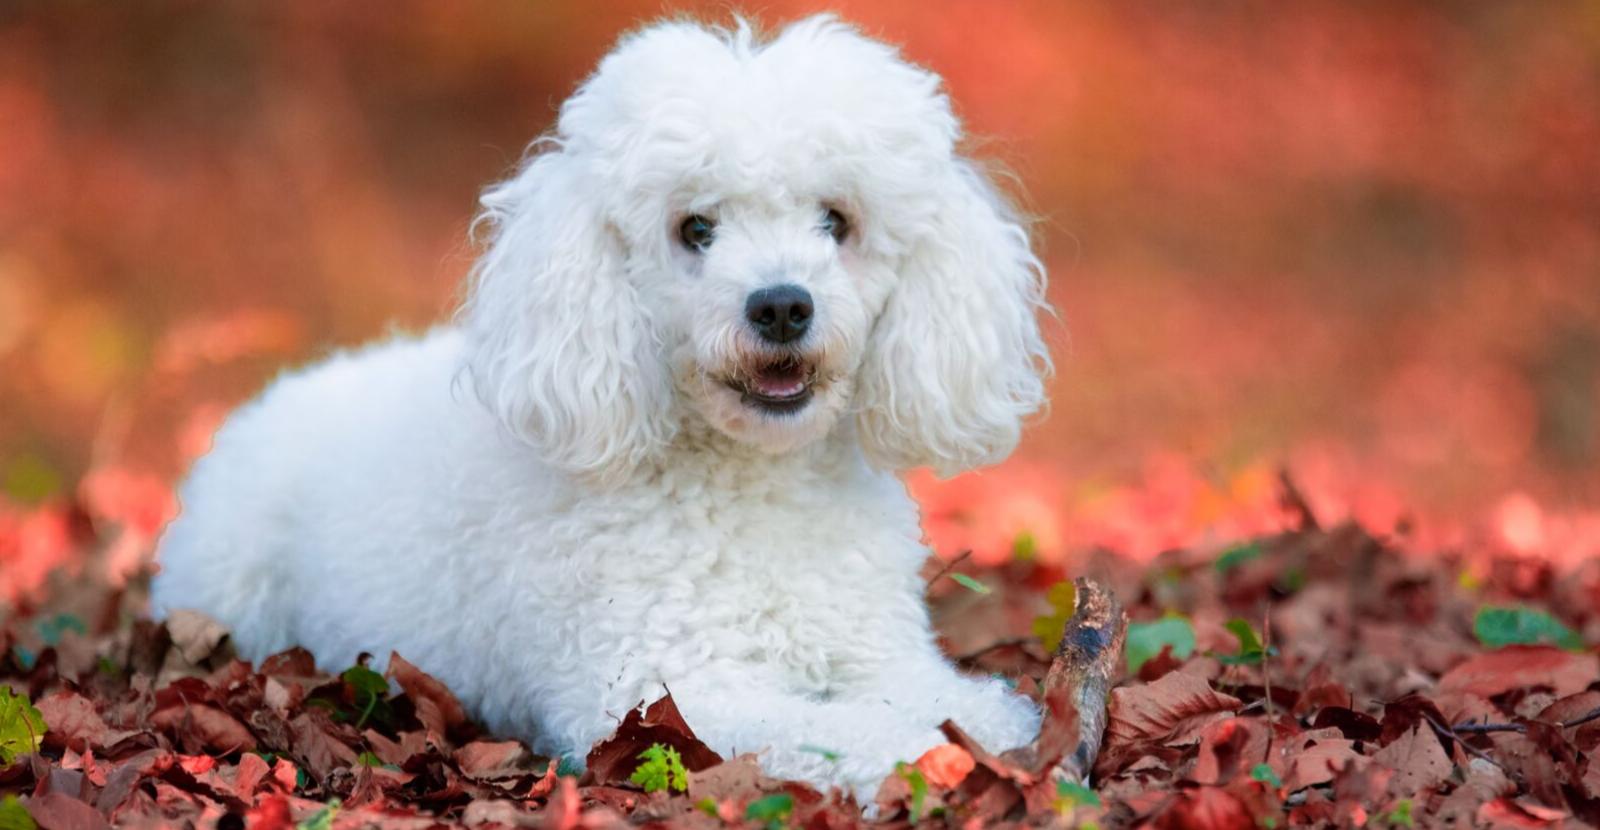 White Minature Poodle